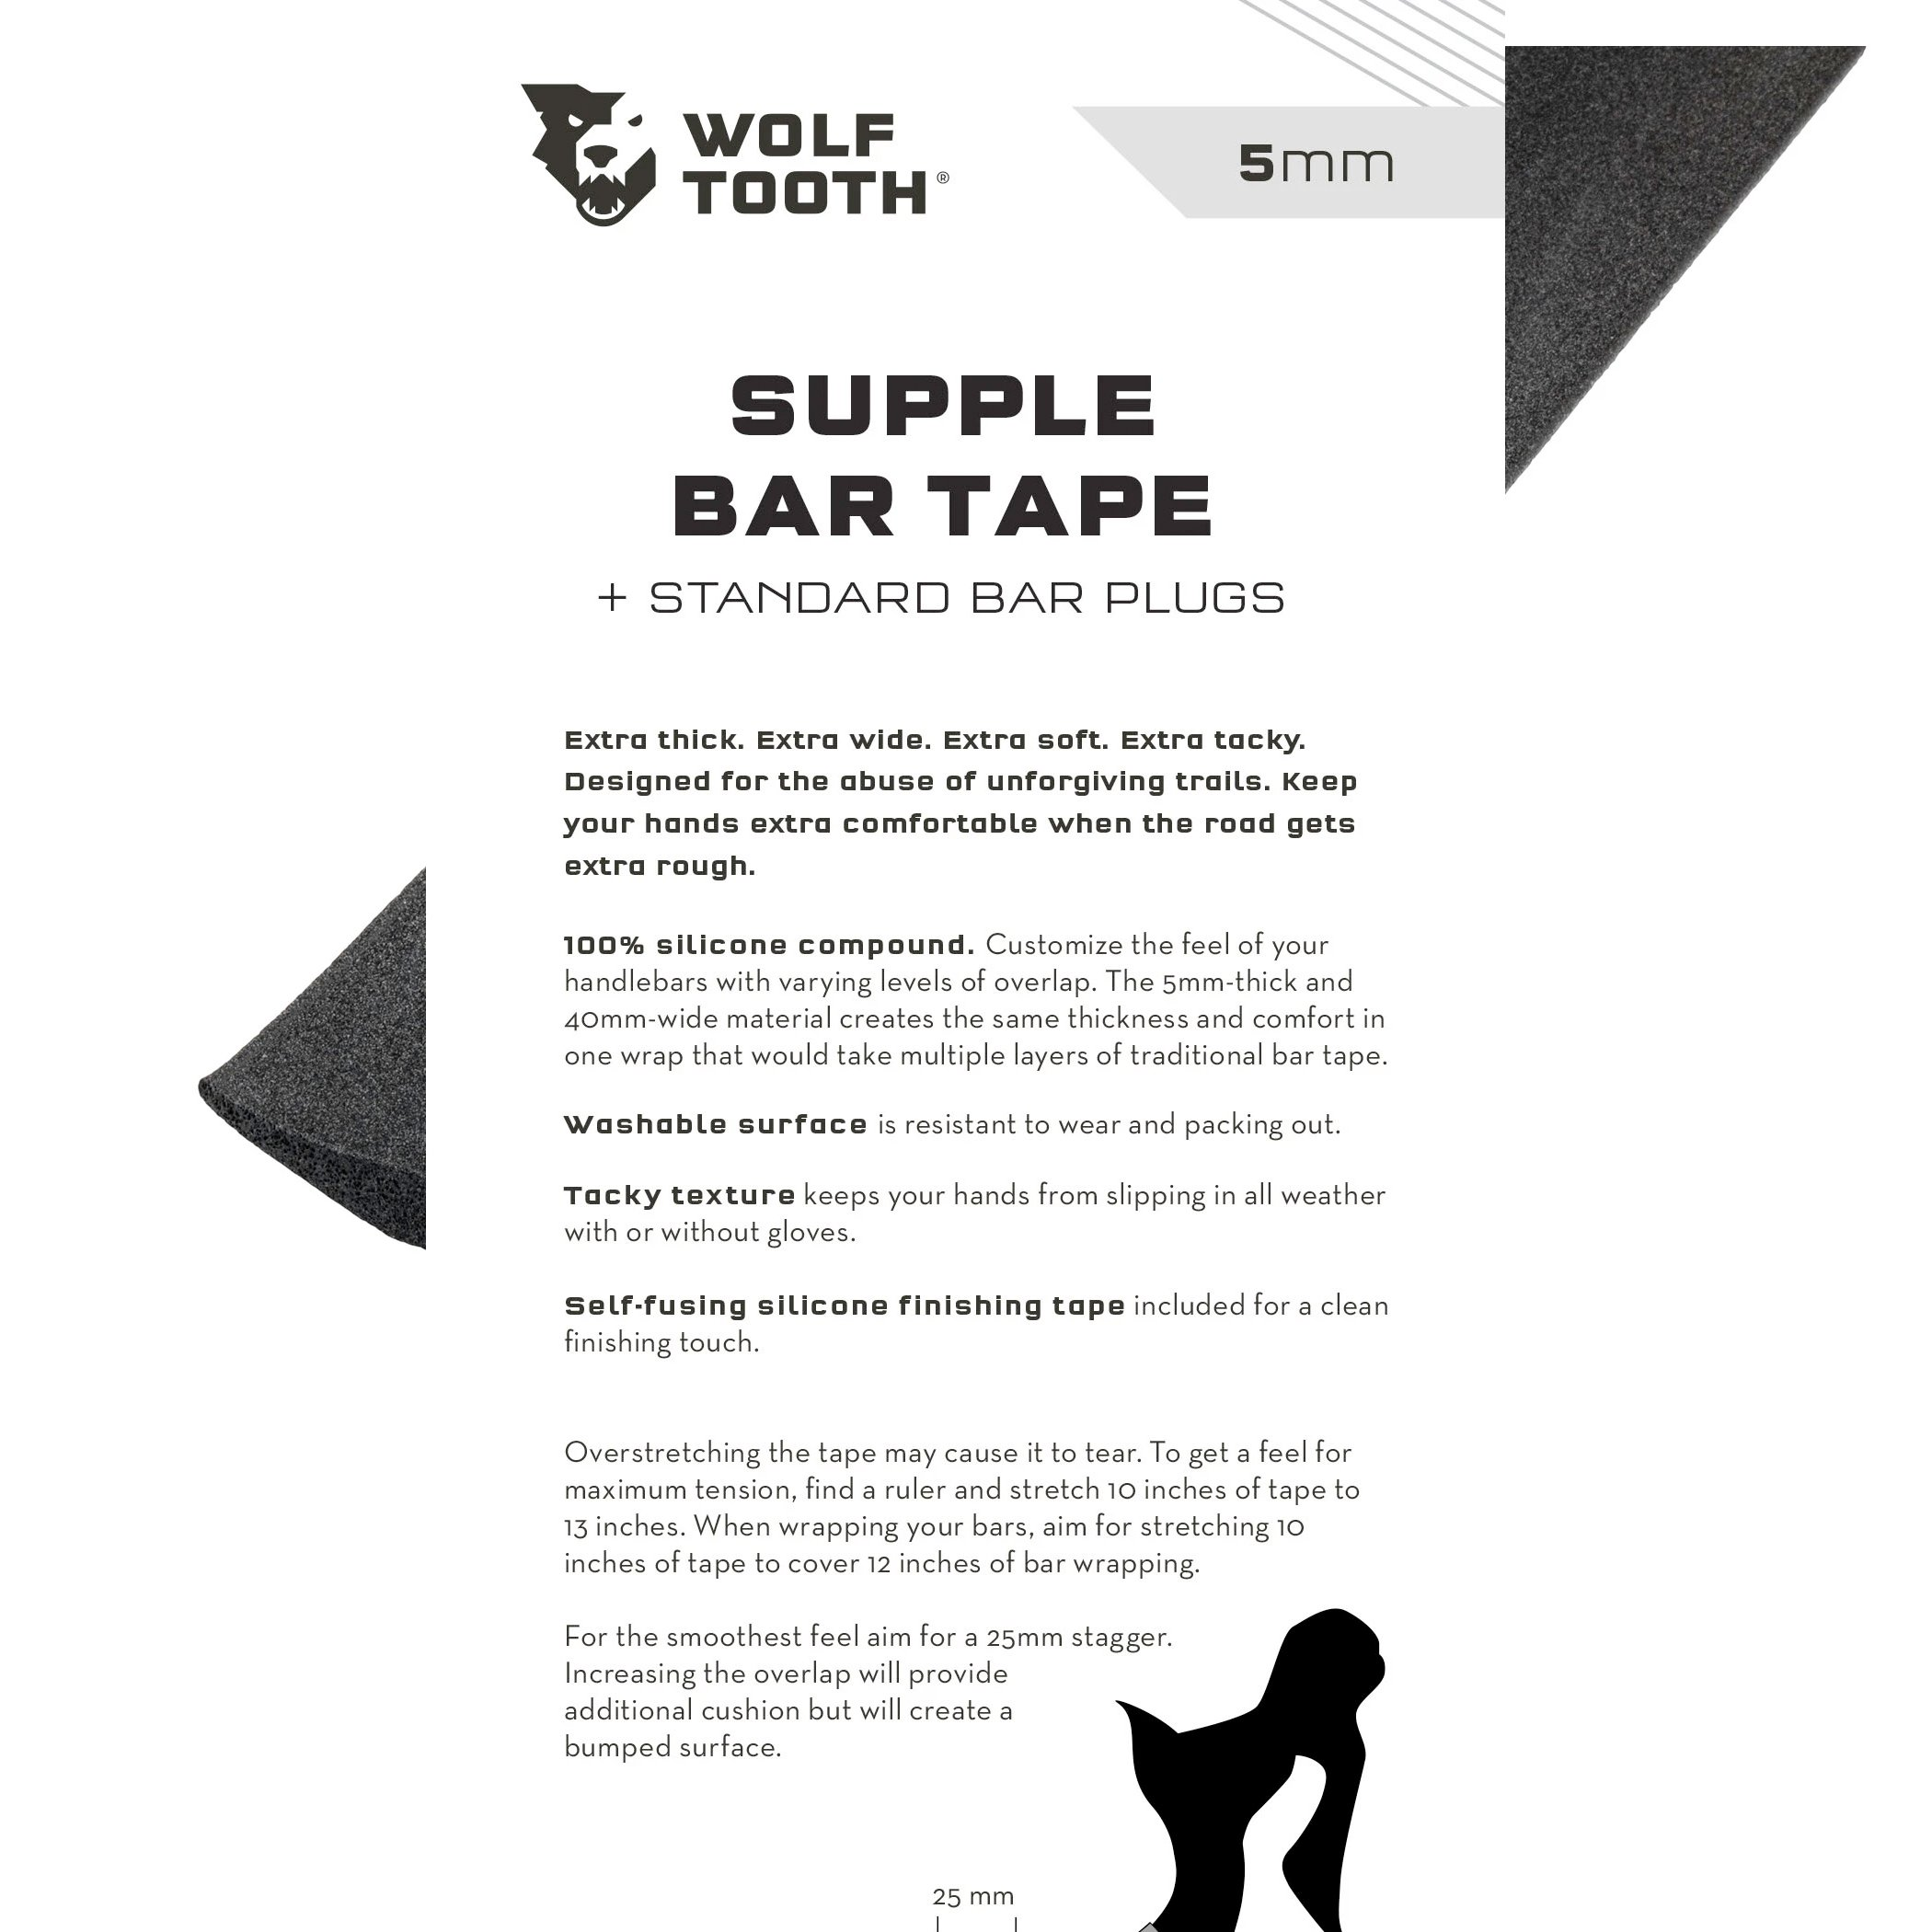 Bar Tape Supple Bar Tape Black Wolf Tooth Components Supple Handlebar Tape